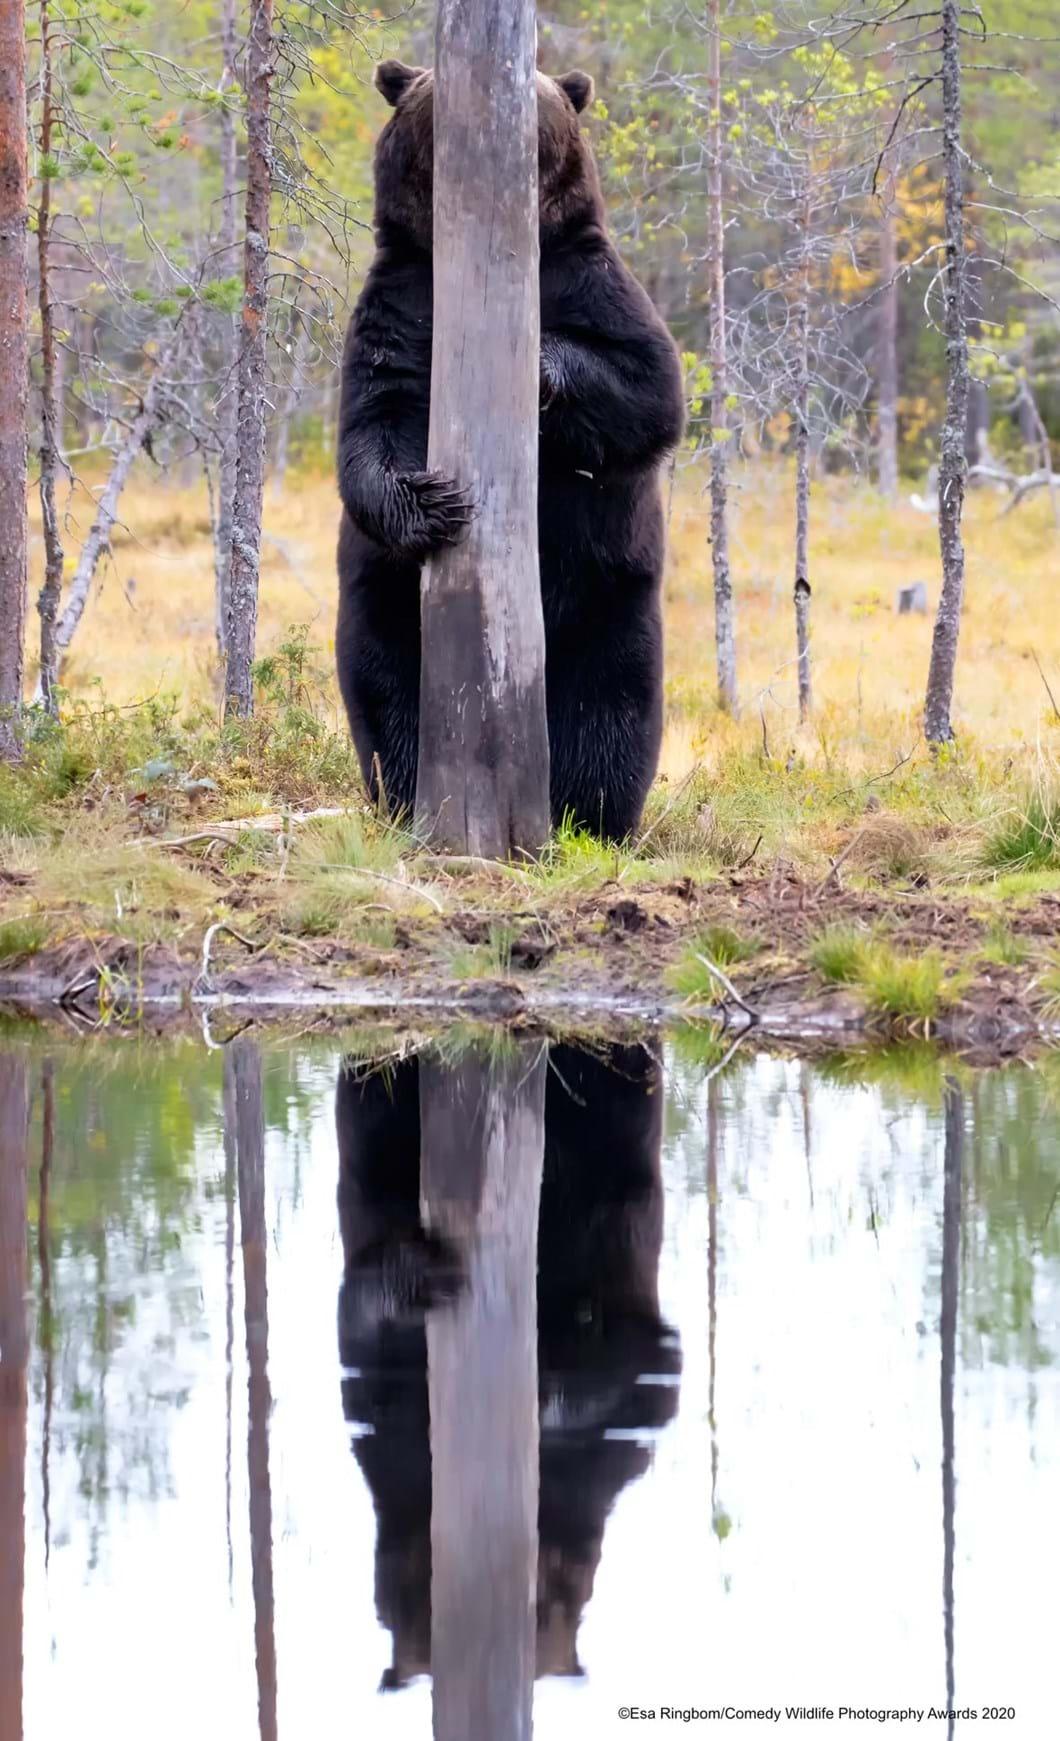 Esa-Ringbom_bear-hiding_2020-09-17.jpg